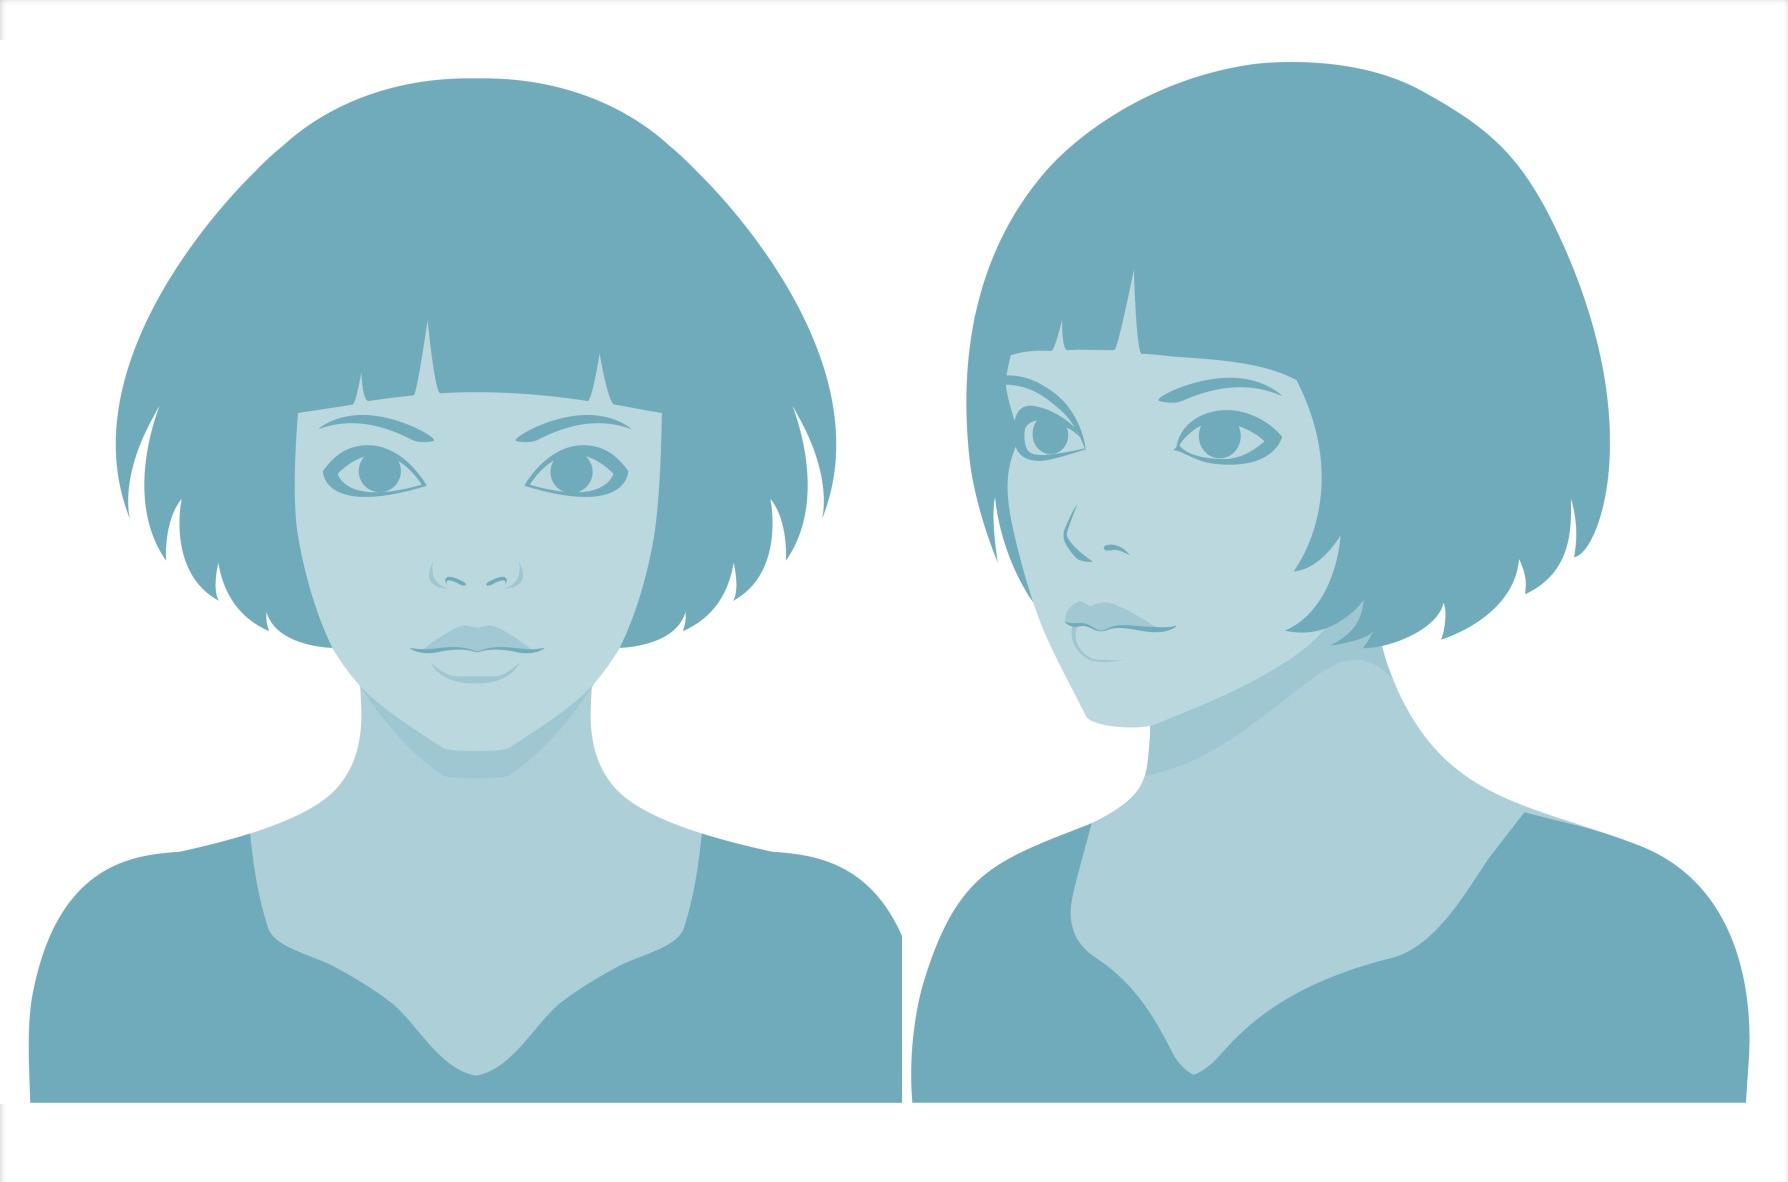 Exploring Intrinsic Gender Identity Using Second Life